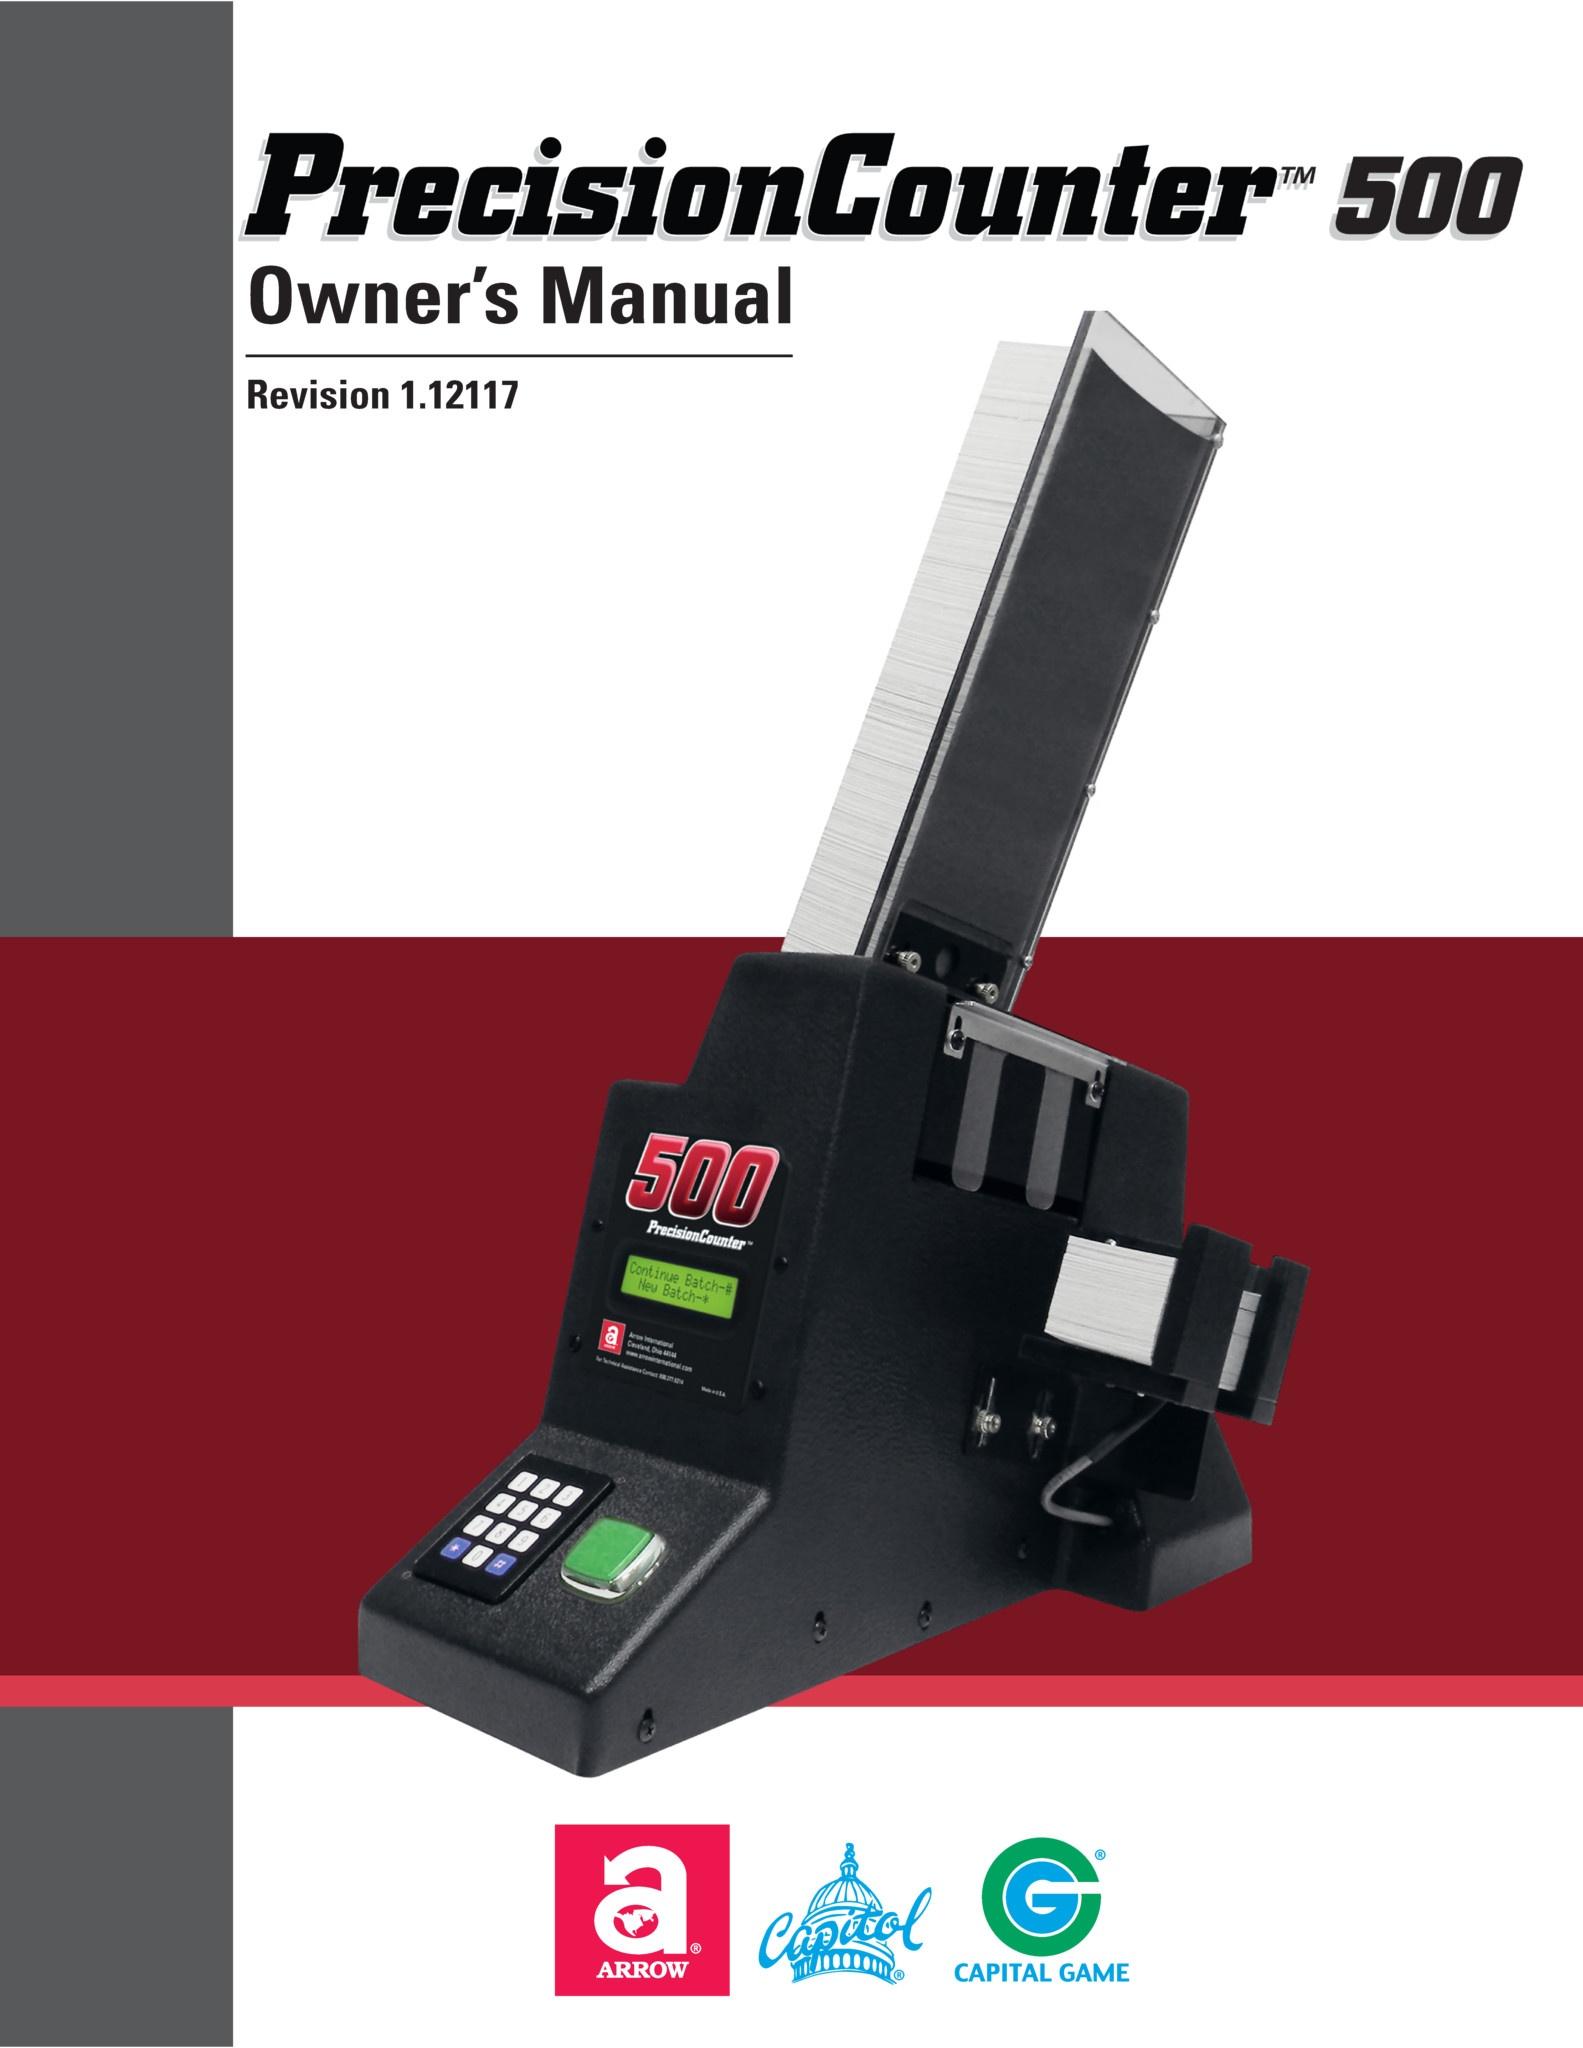 PrecisionCounter500 Manual Equipment Manuals